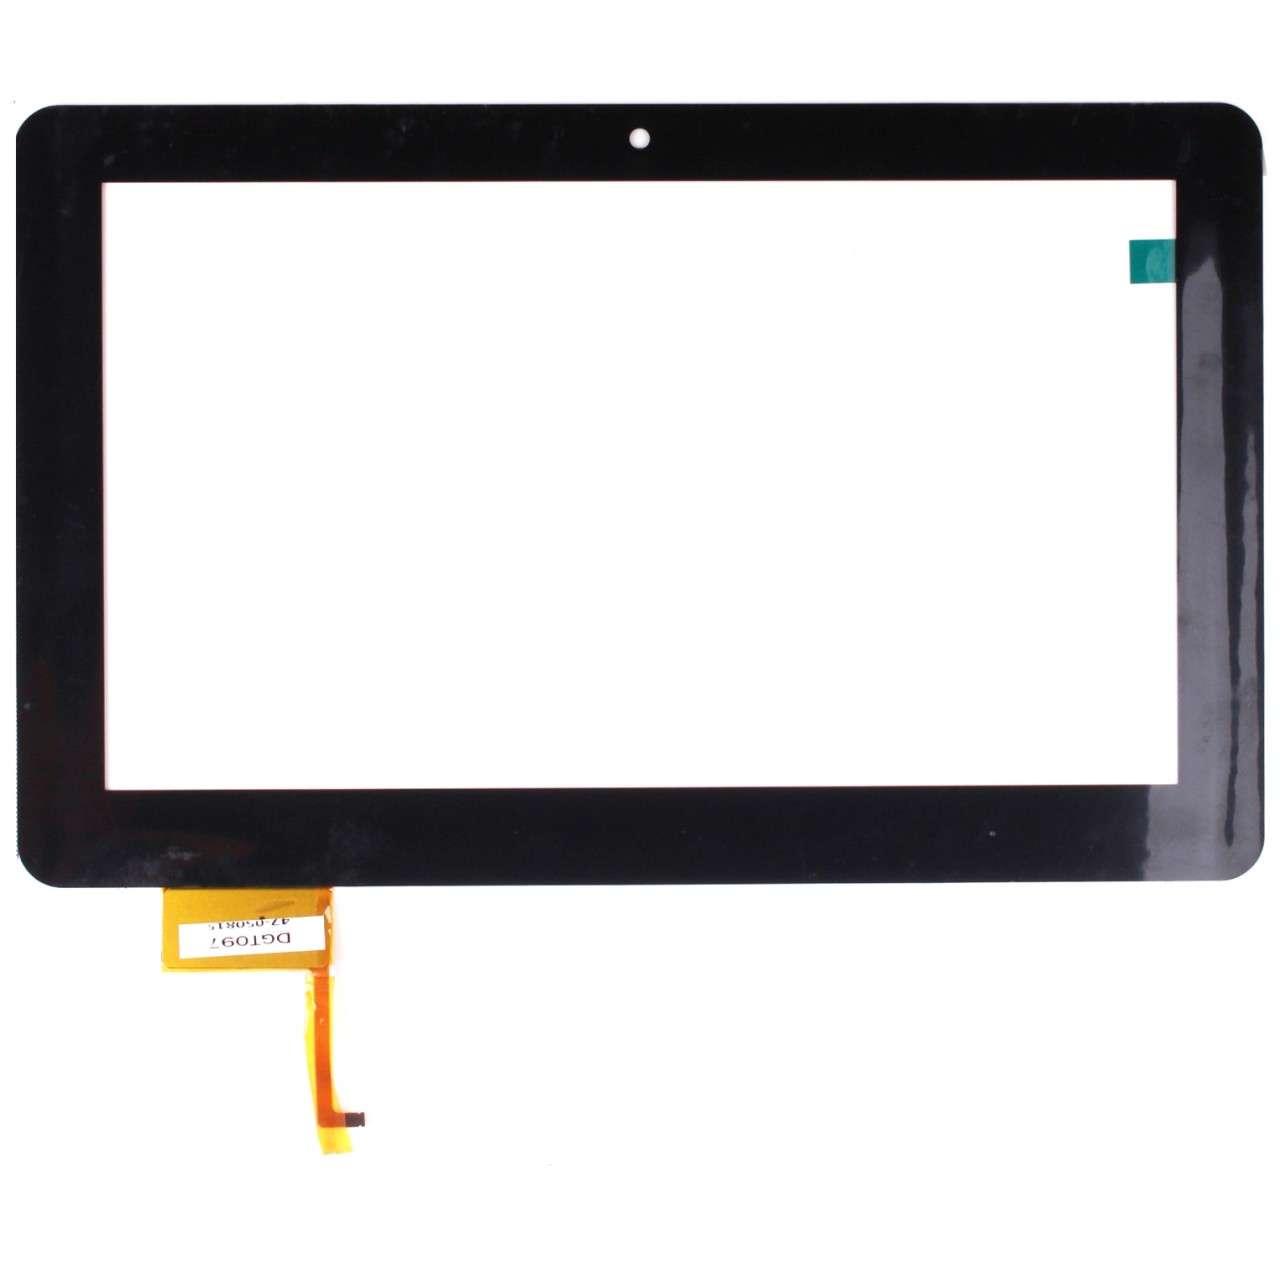 Touchscreen Digitizer Logicom TAB 1050 4GO M1003 Geam Sticla Tableta imagine powerlaptop.ro 2021